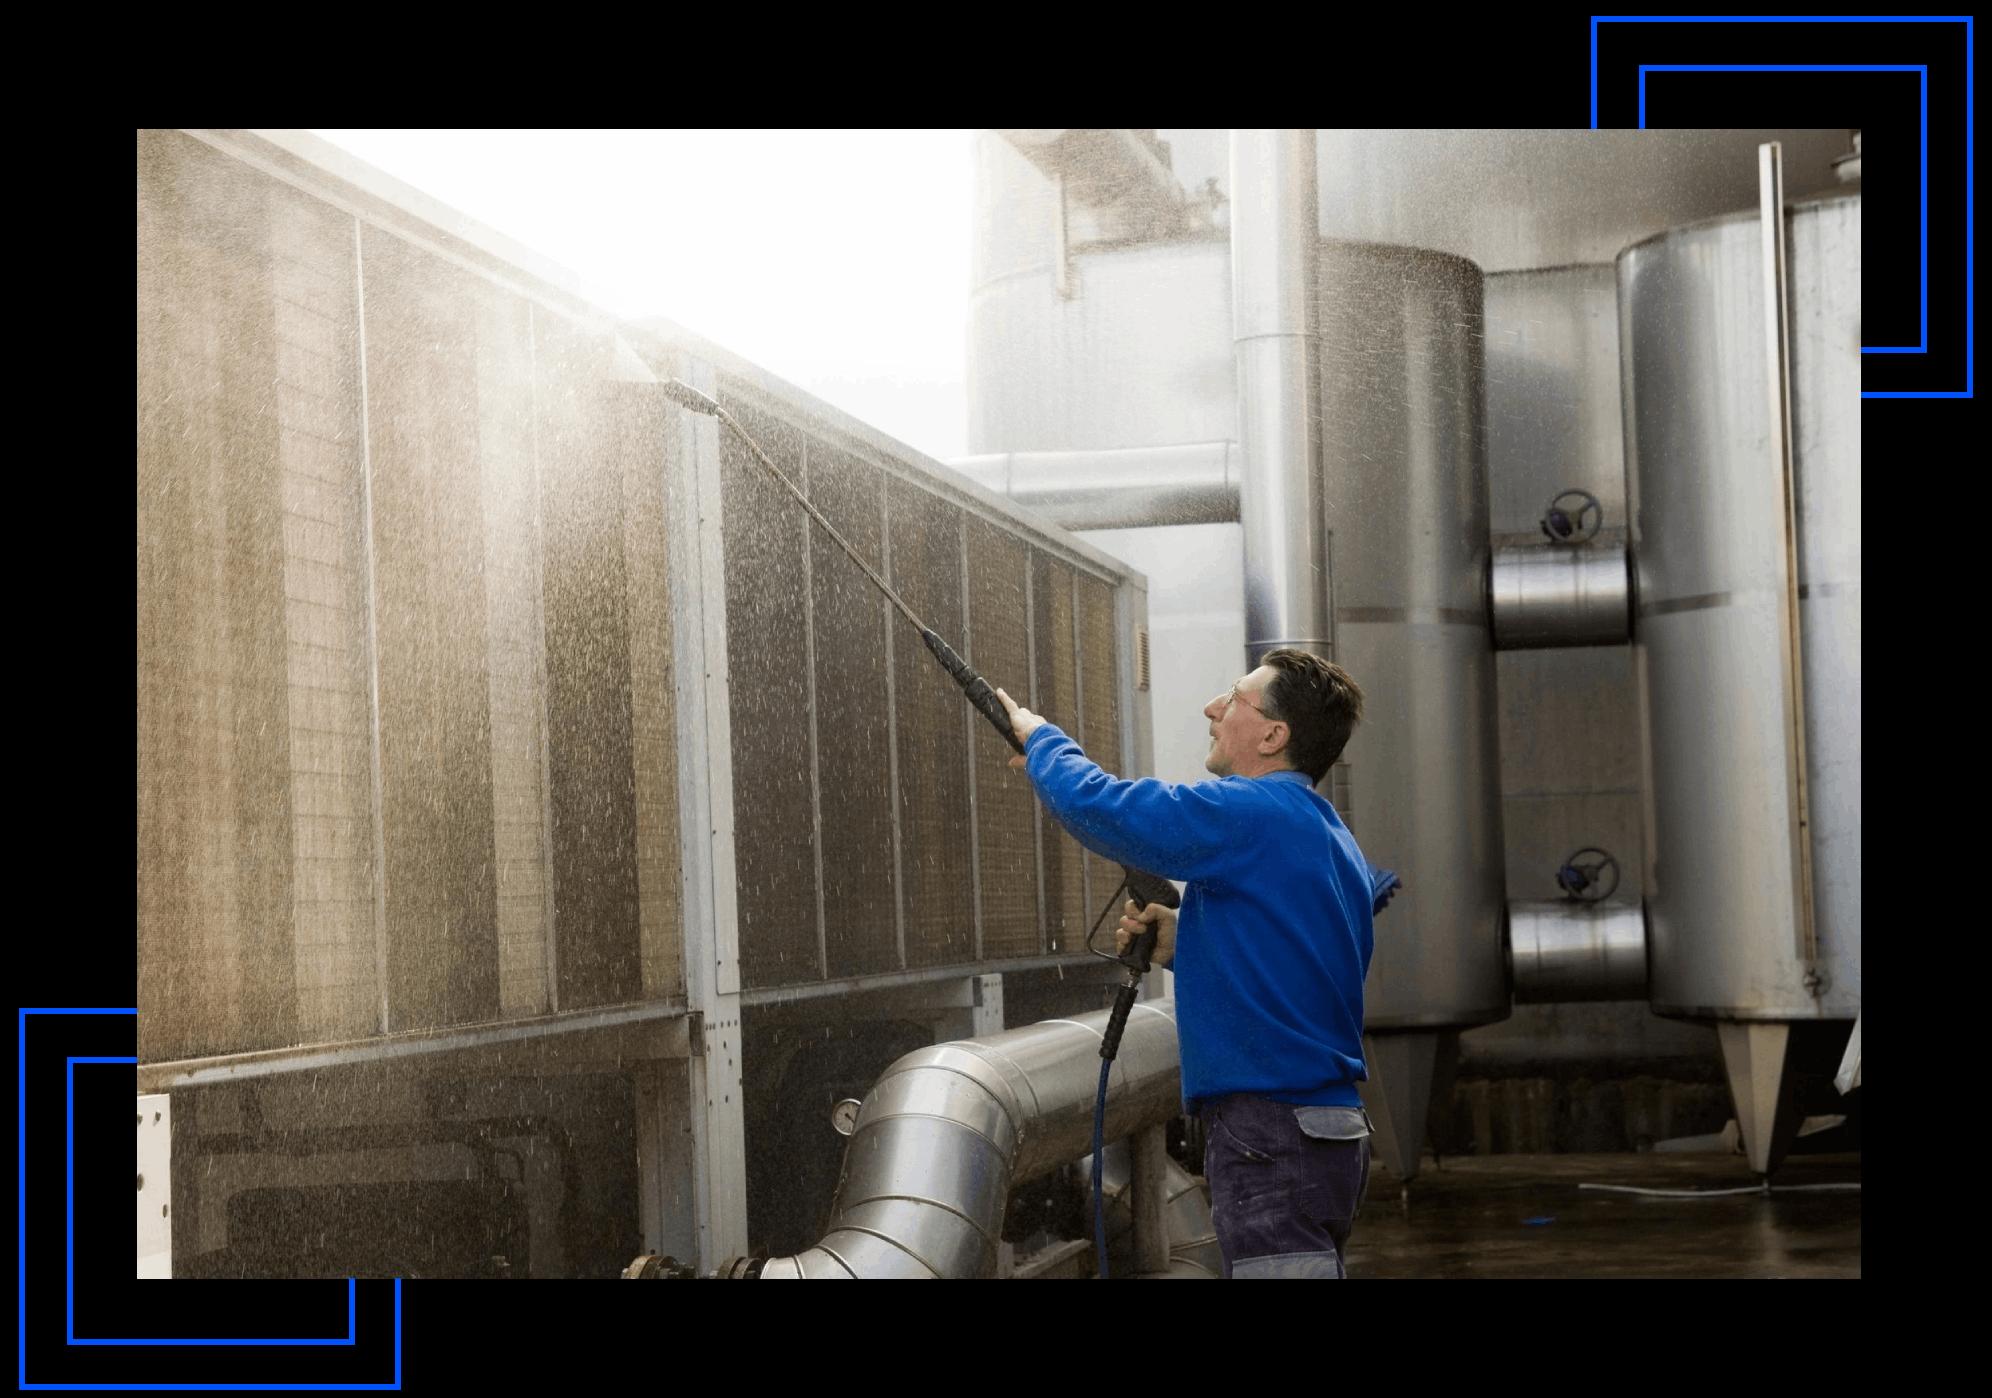 Power Washing Wall